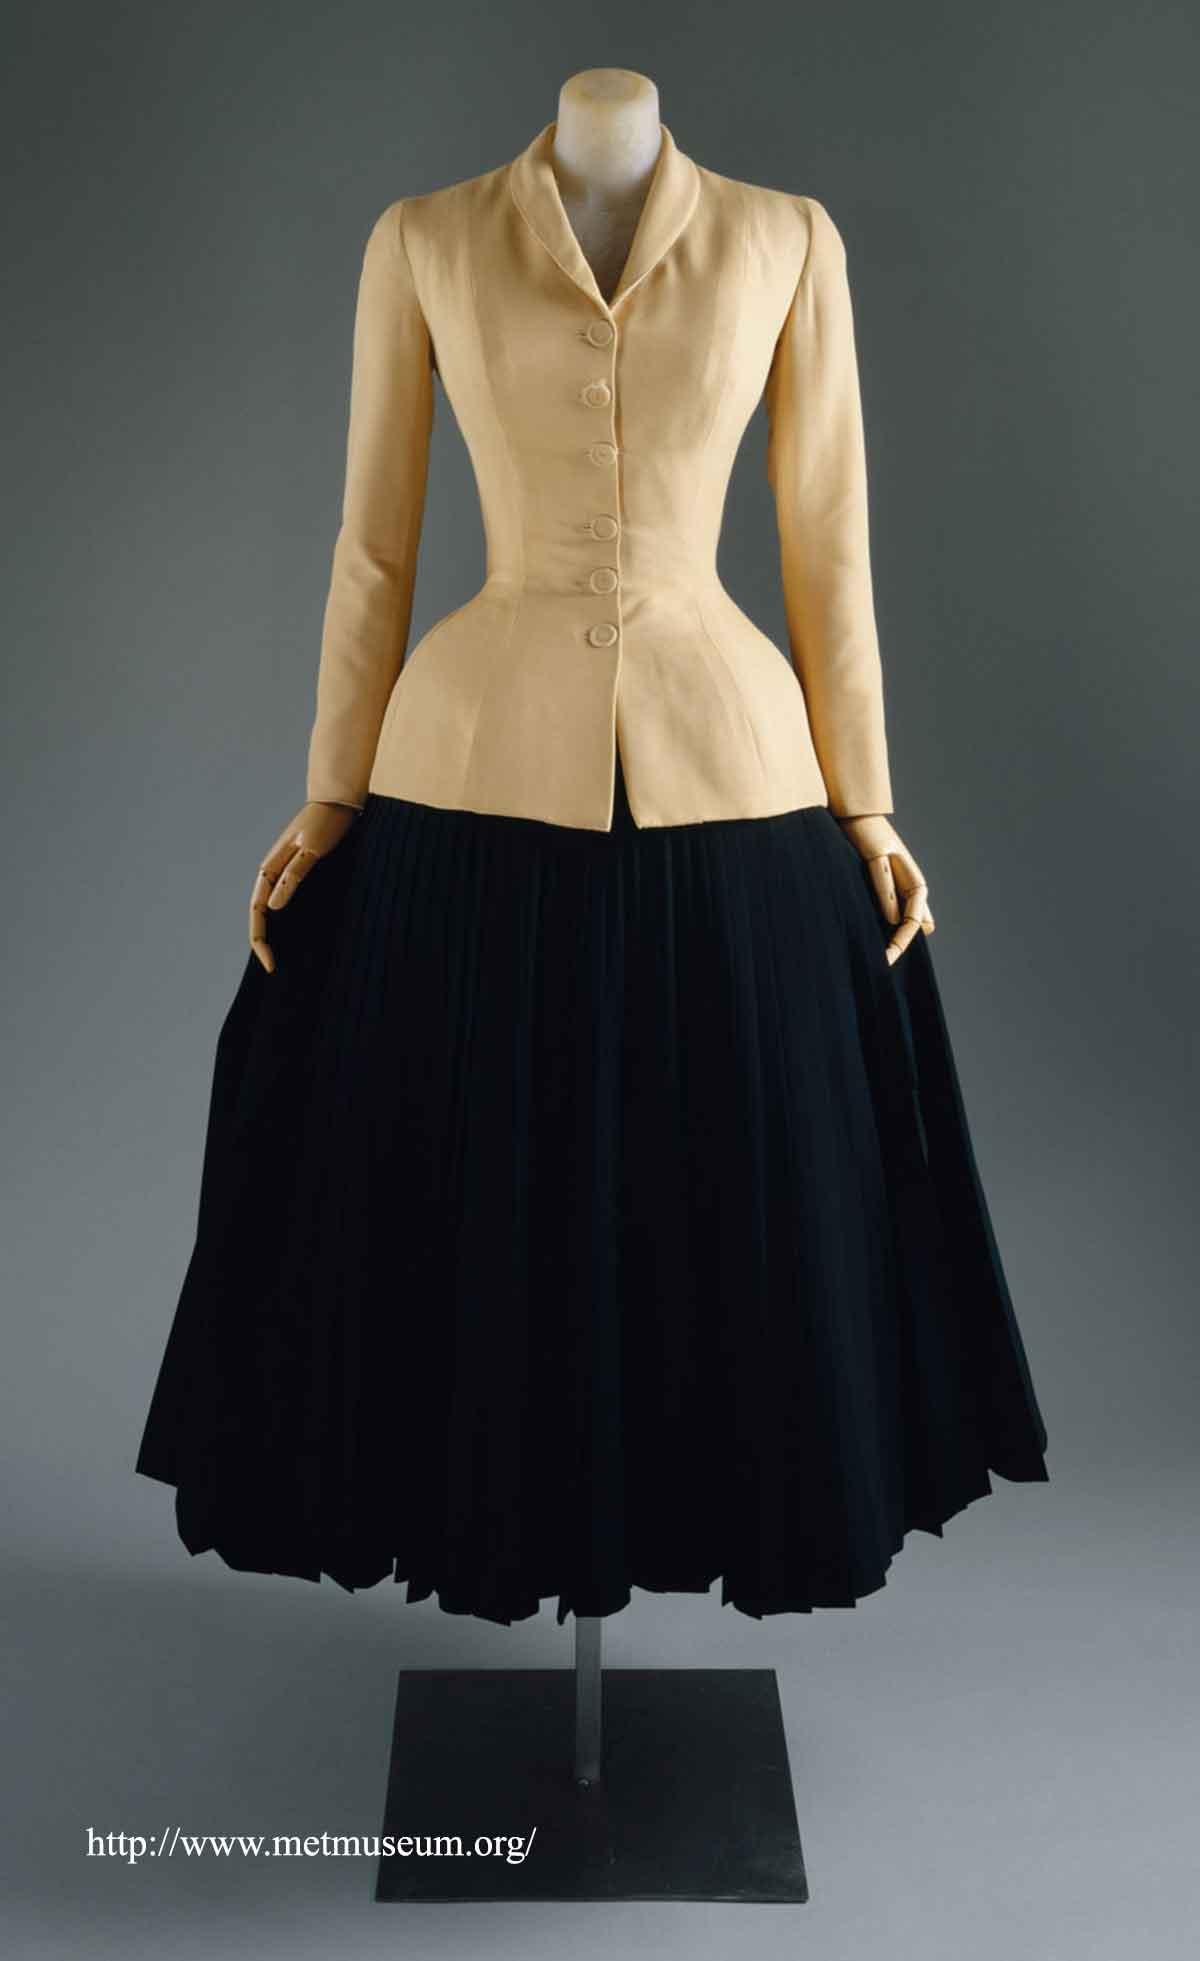 dior-model-renee-in--the-bar-suit-of-1947-b